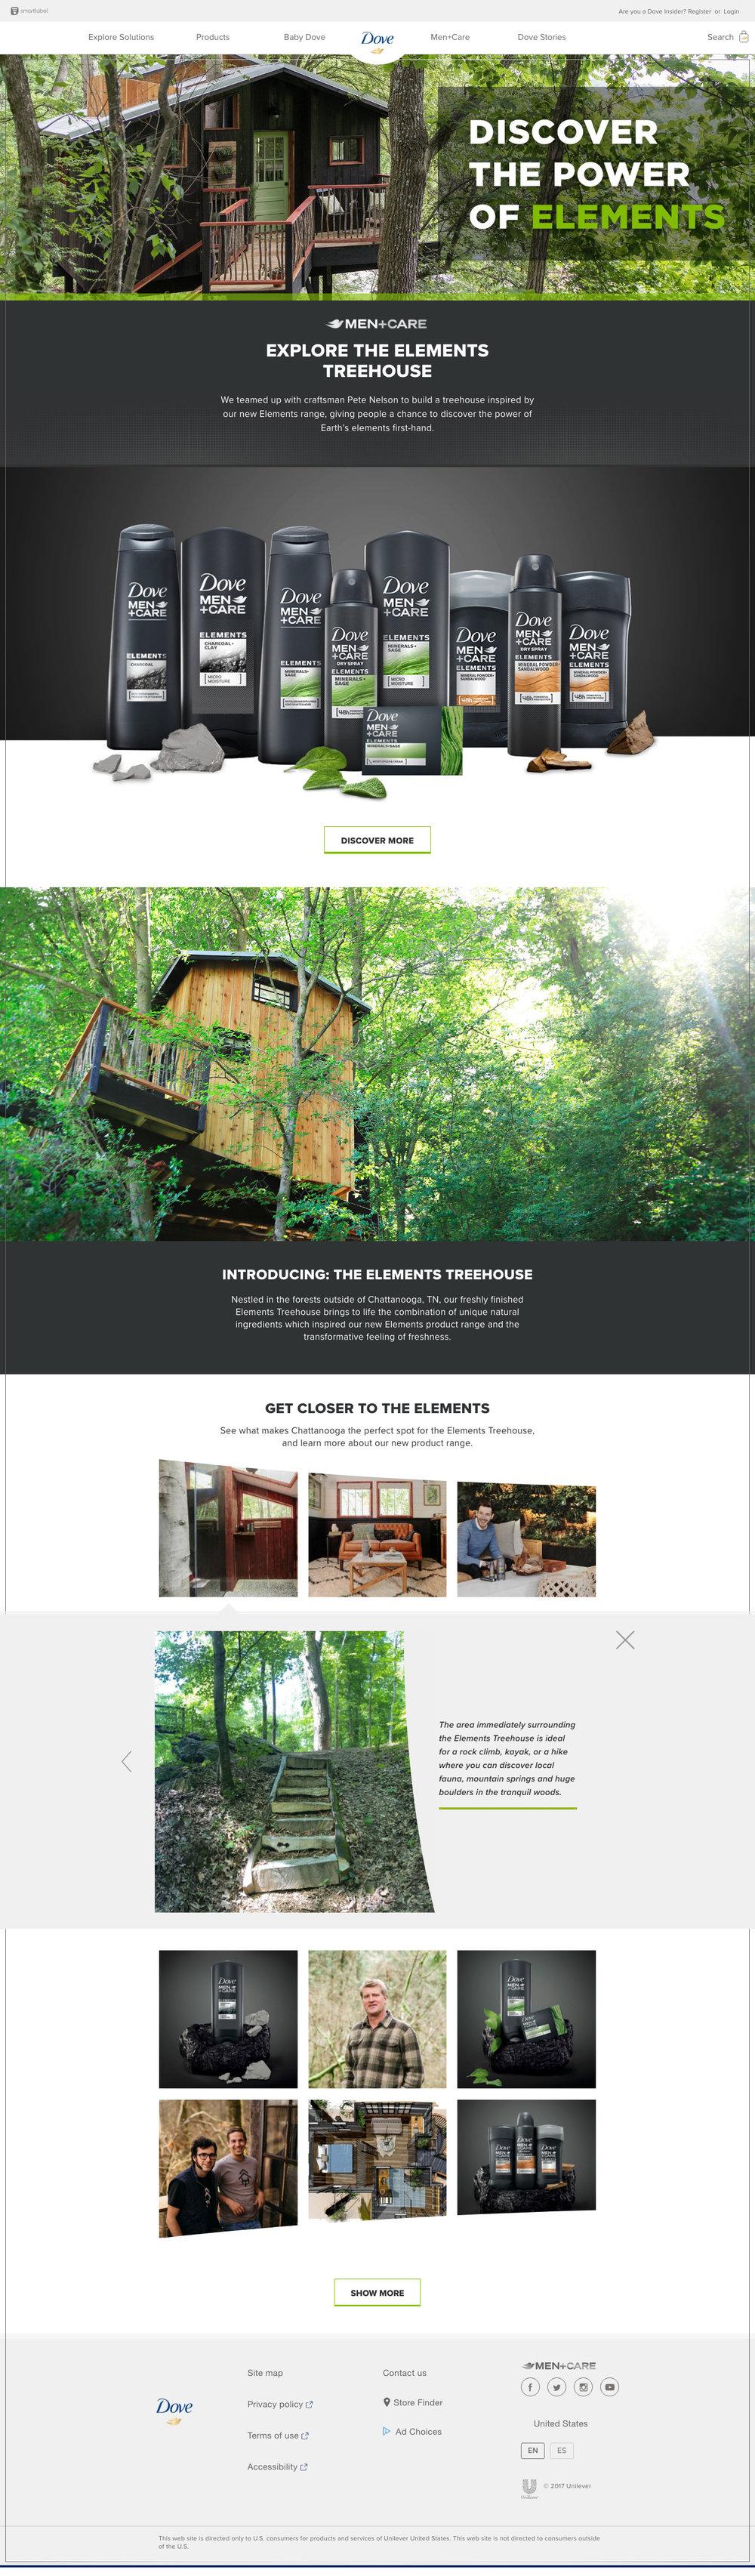 treehouse-psda.jpg